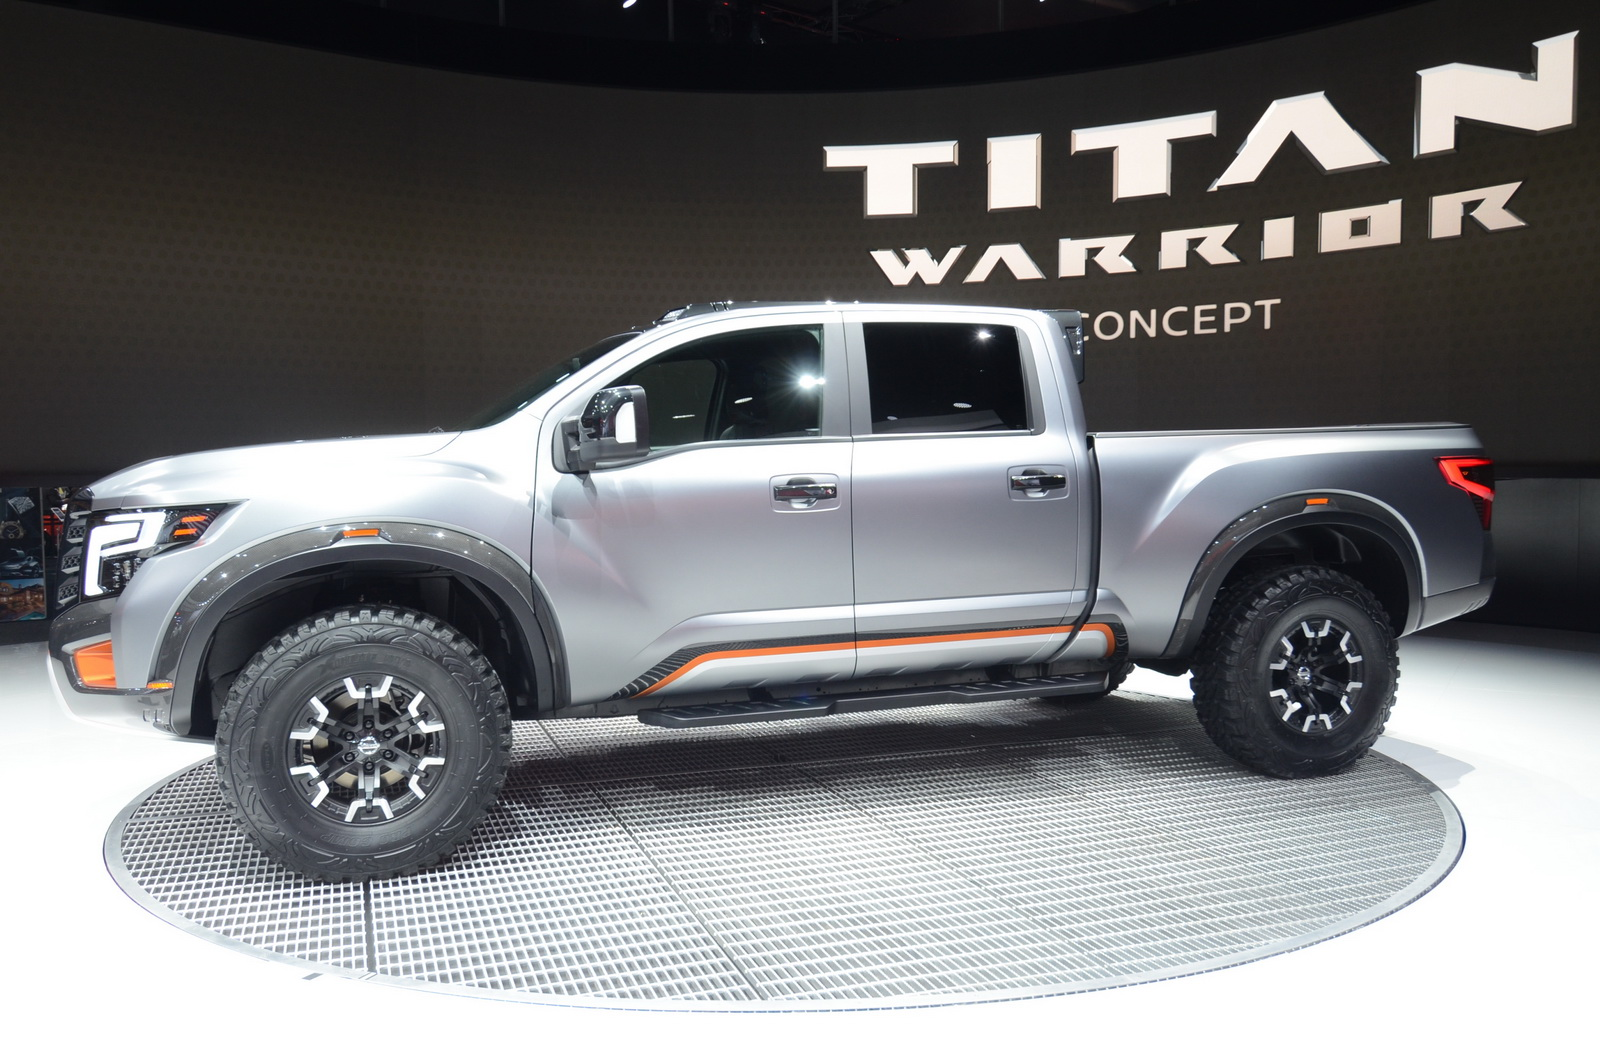 Nissan 5.0 Cummins >> Nissan's Titan Warrior Concept Is Proof We Need More Baja-Inspired Trucks | Carscoops